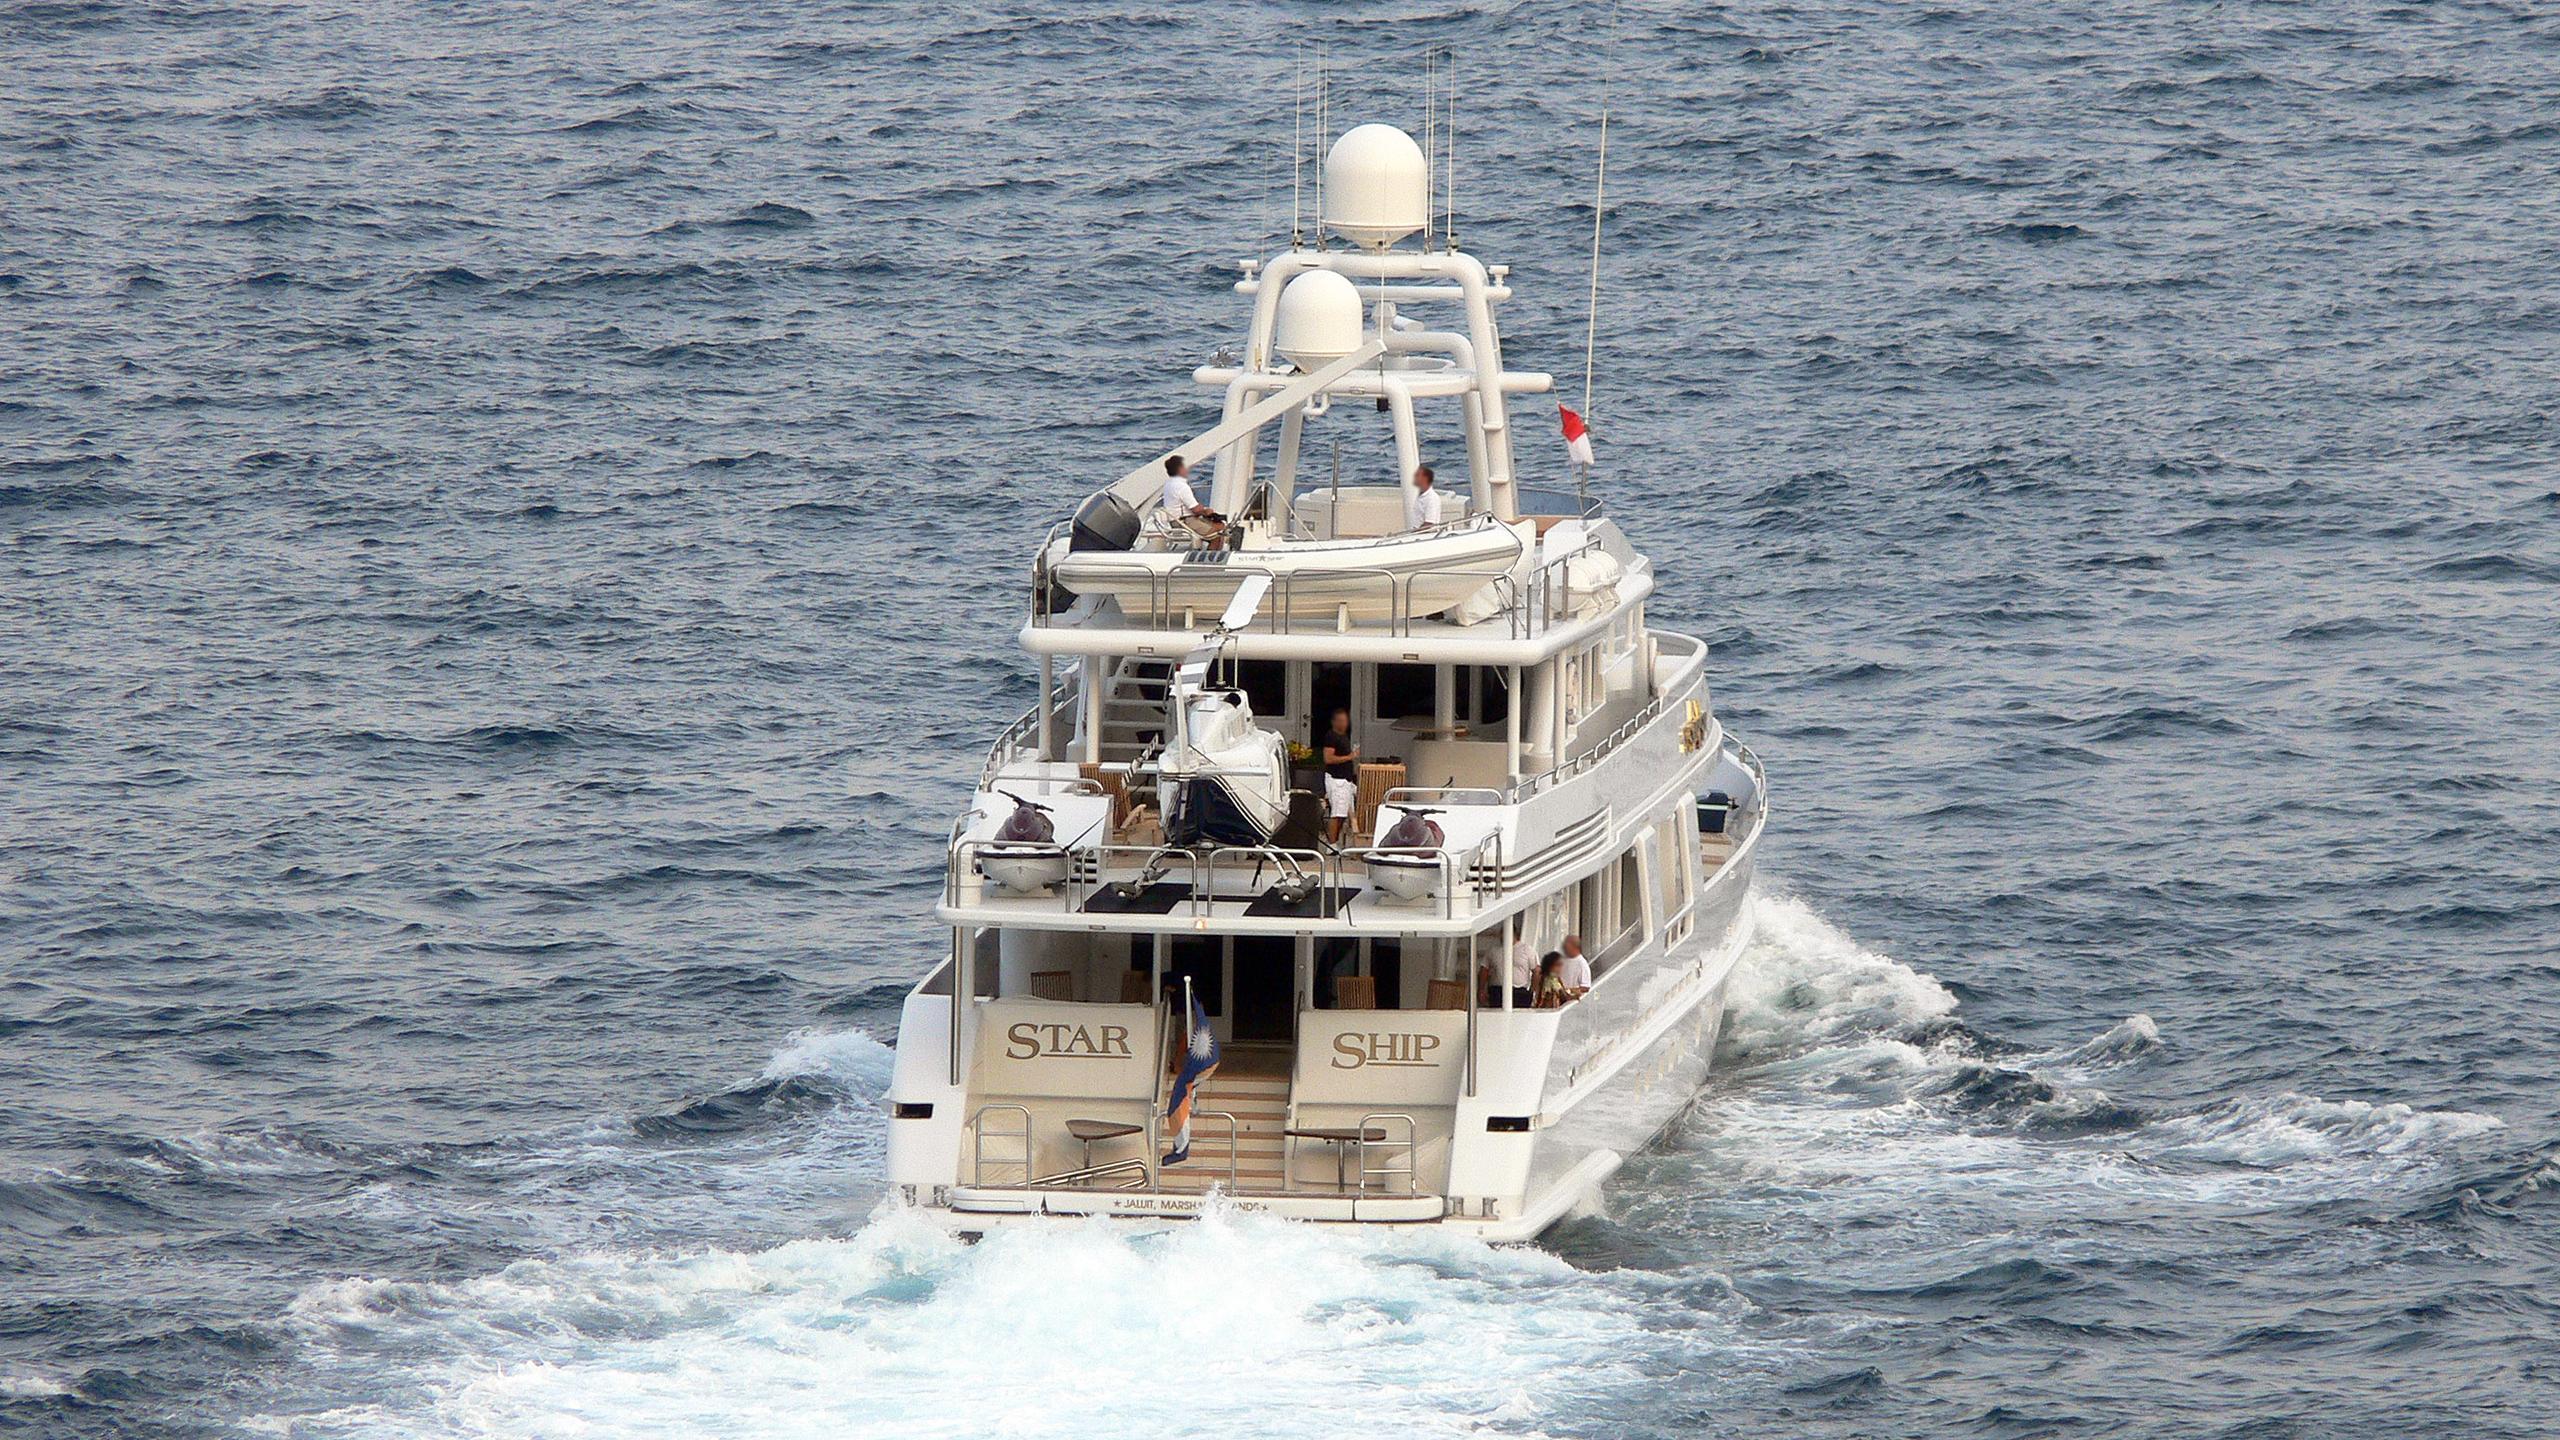 starship-motor-yacht-van-mill-topaz-143-1988-44m-cruising-stern